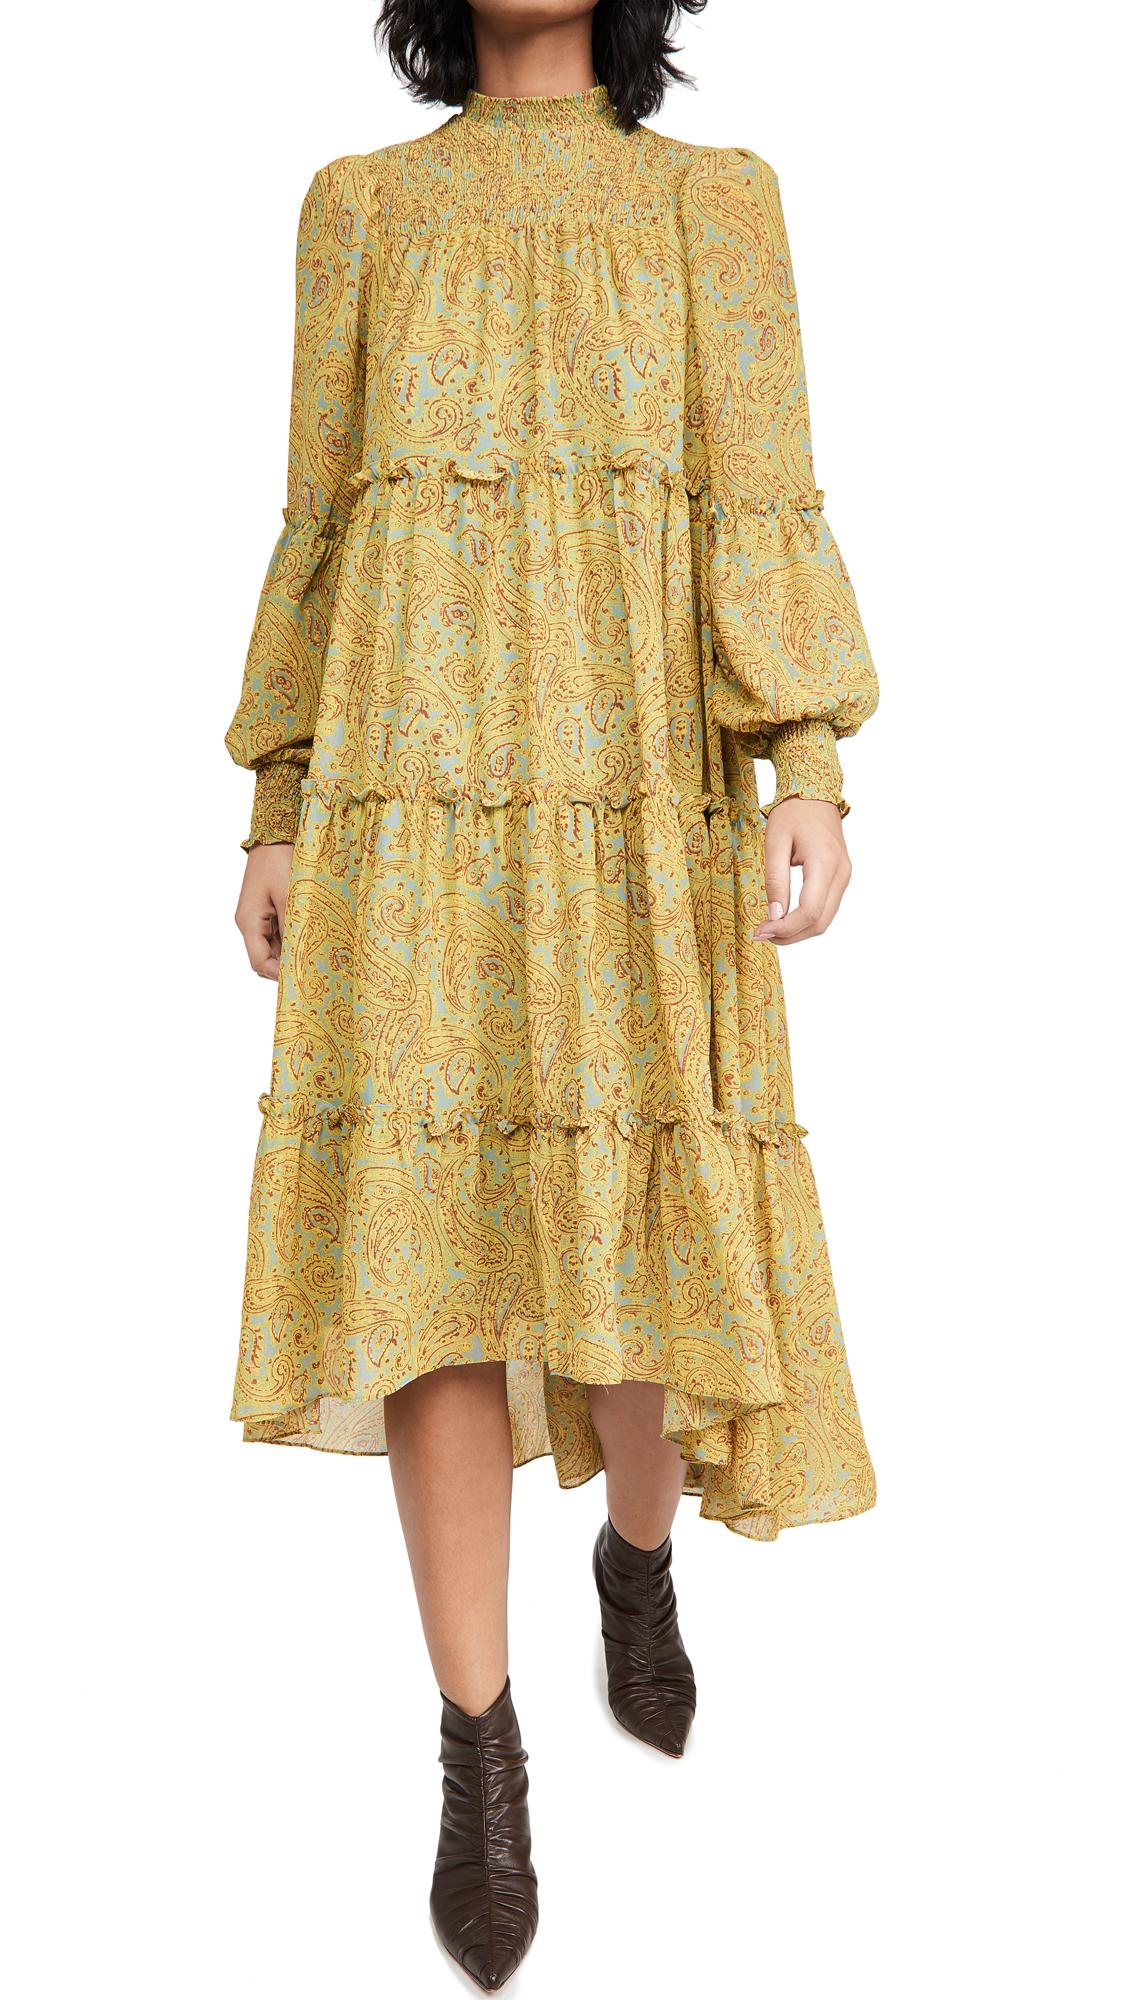 CINQ À SEPT HIGH LOW RIKA DRESS